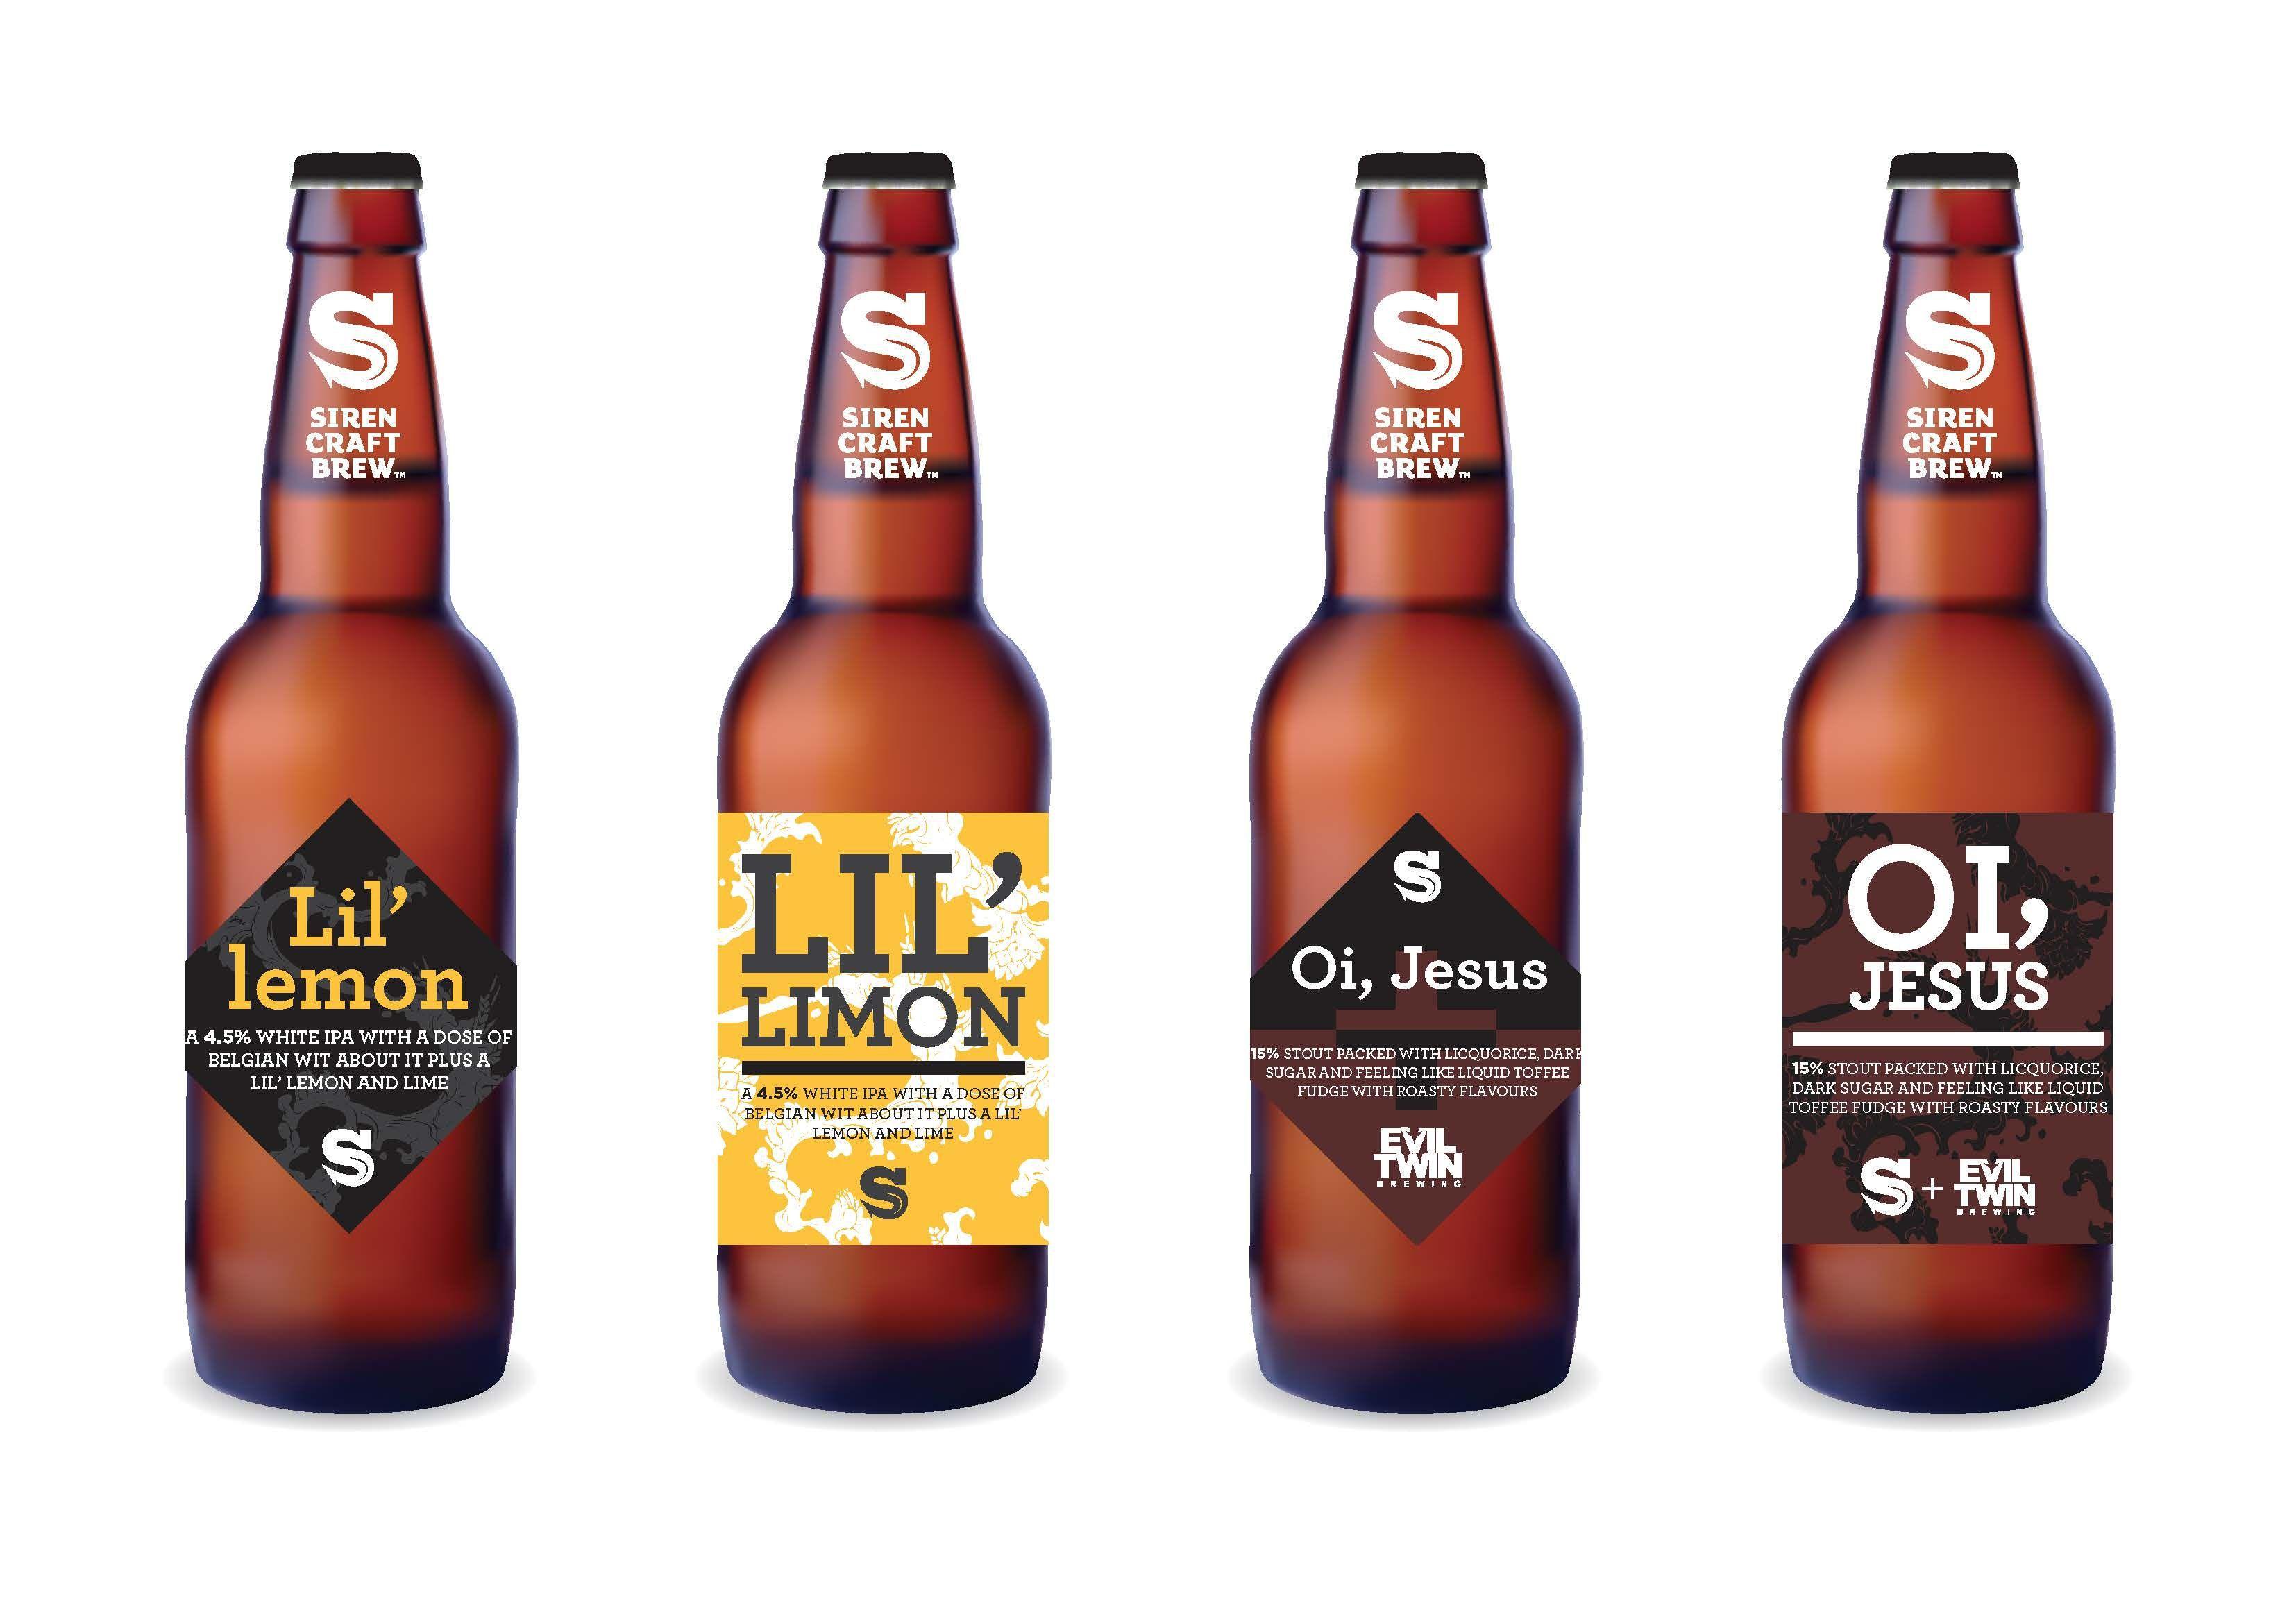 002 Shocking Beer Bottle Label Template Concept  Free Dimension WordFull